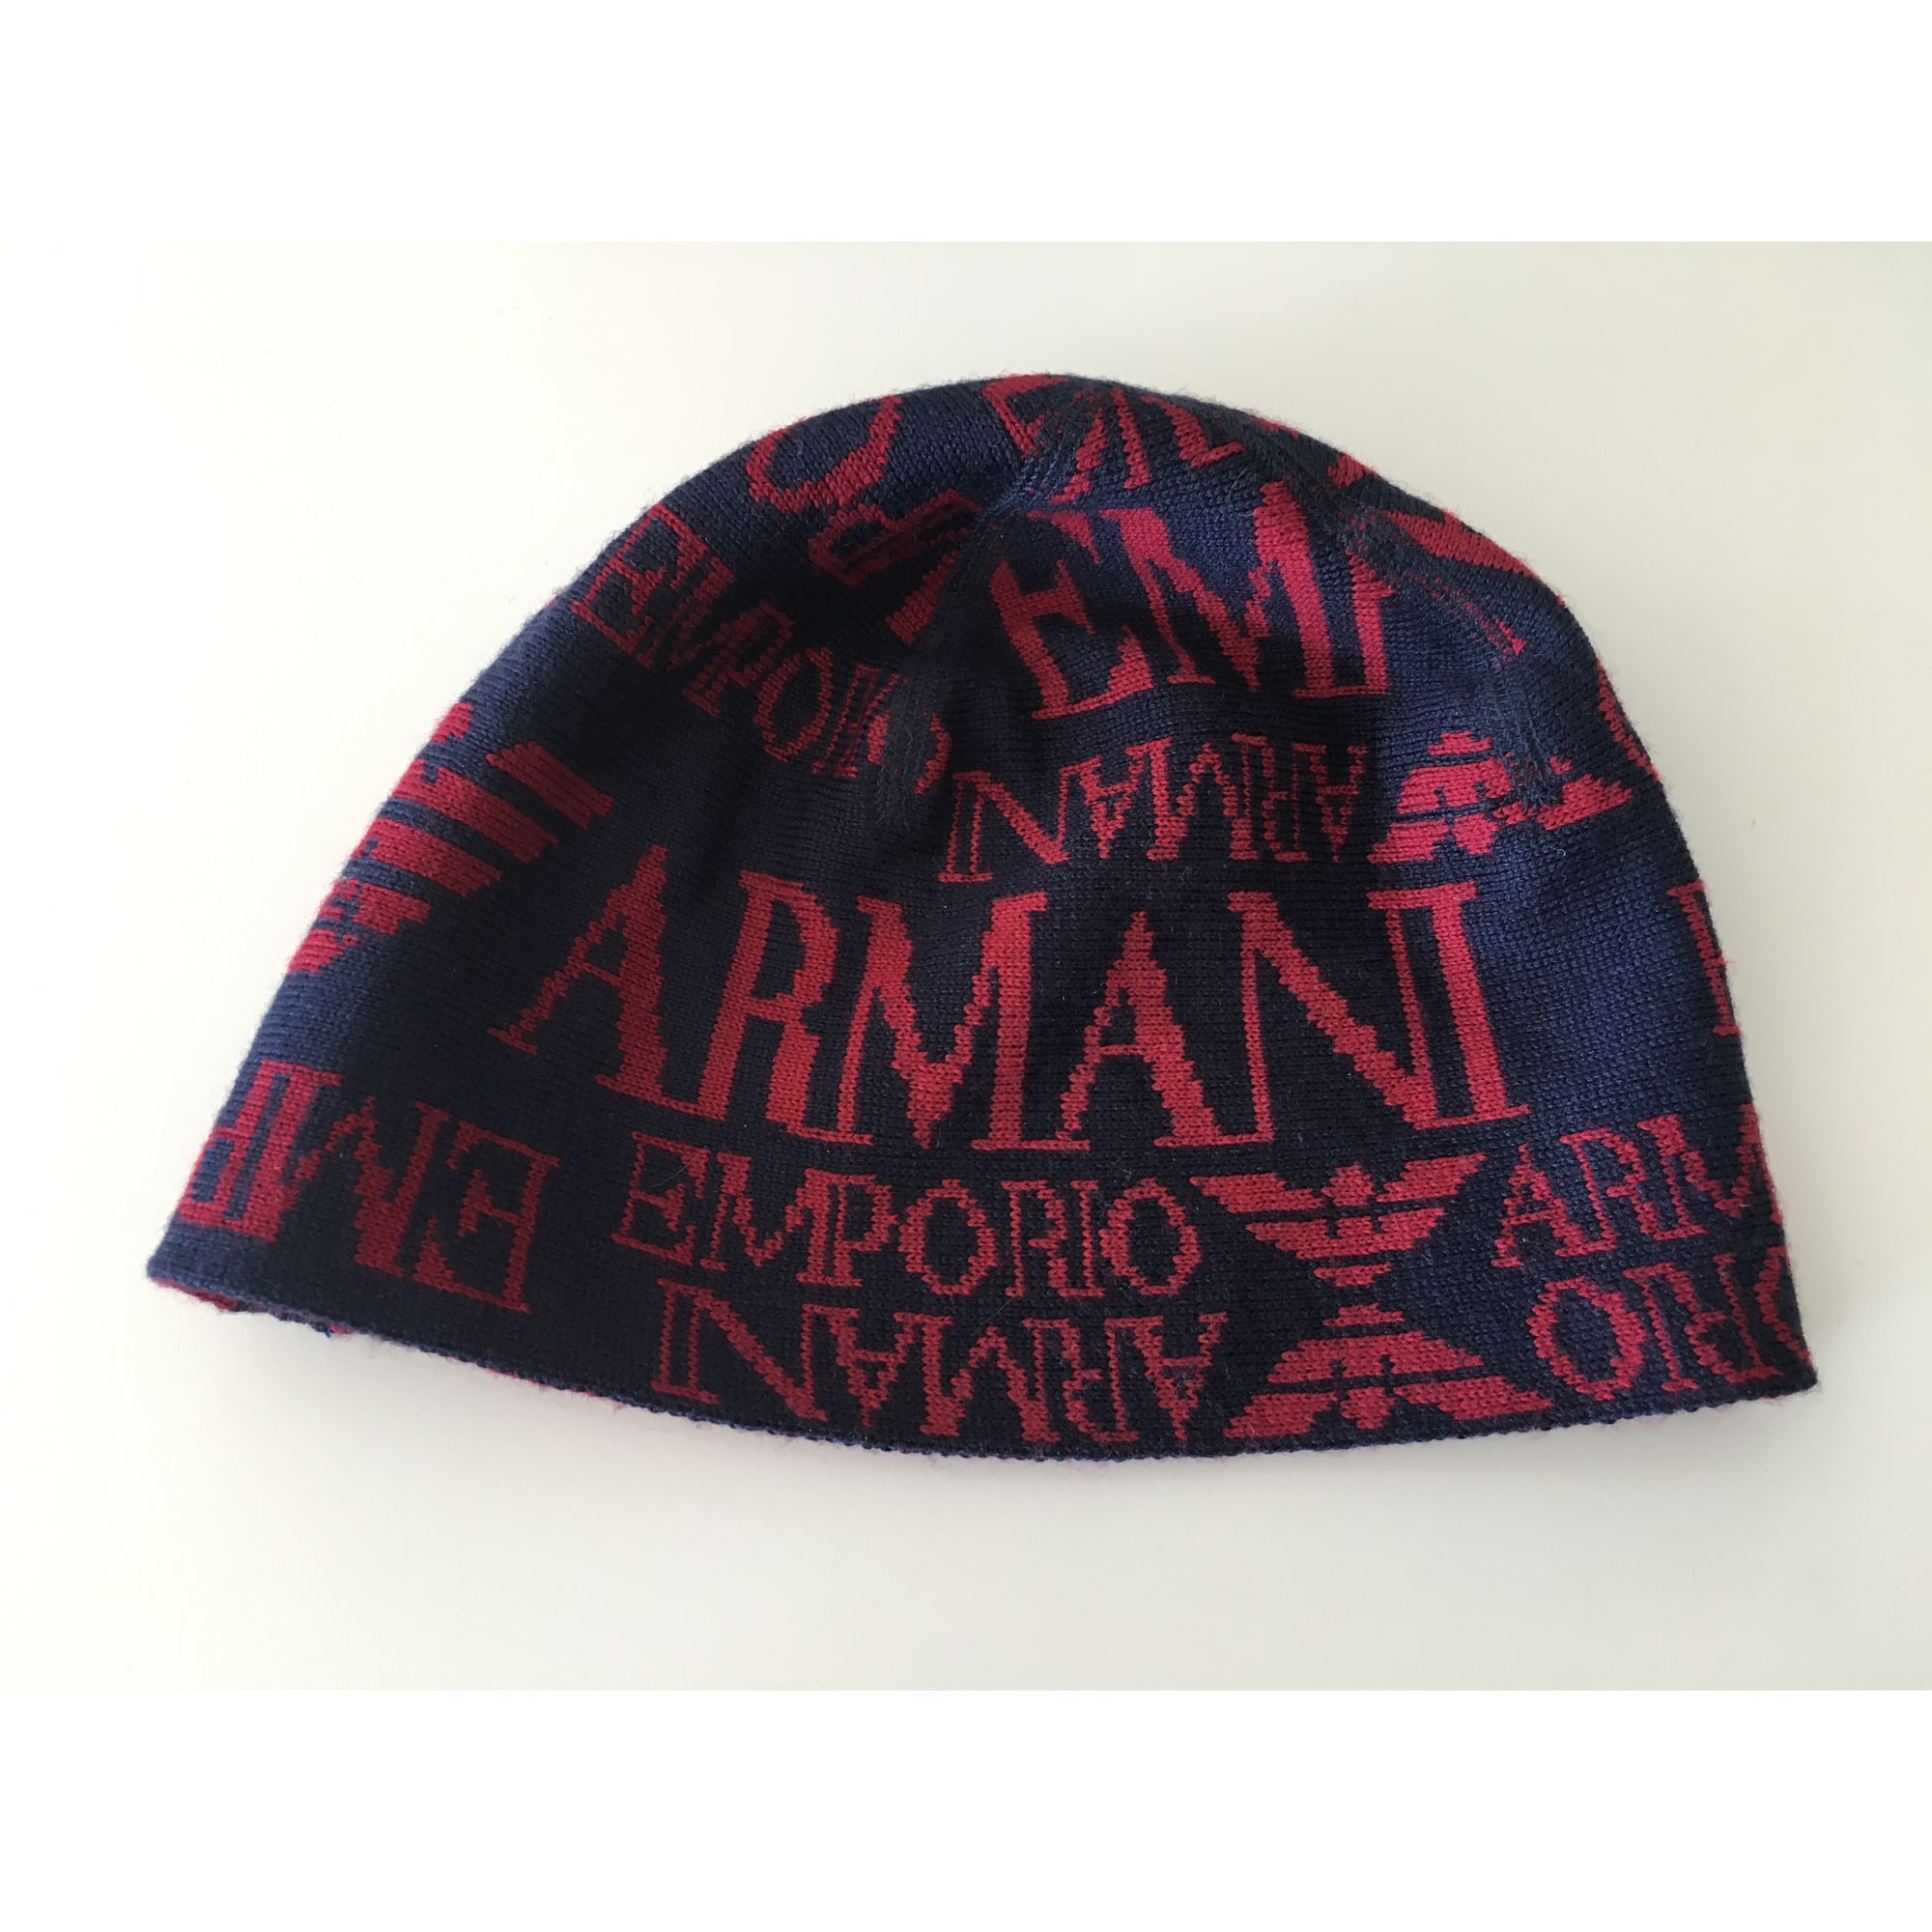 Bonnet EMPORIO ARMANI 57 bleu vendu par Angelina jolie - 7430710 6561c3f0b7e